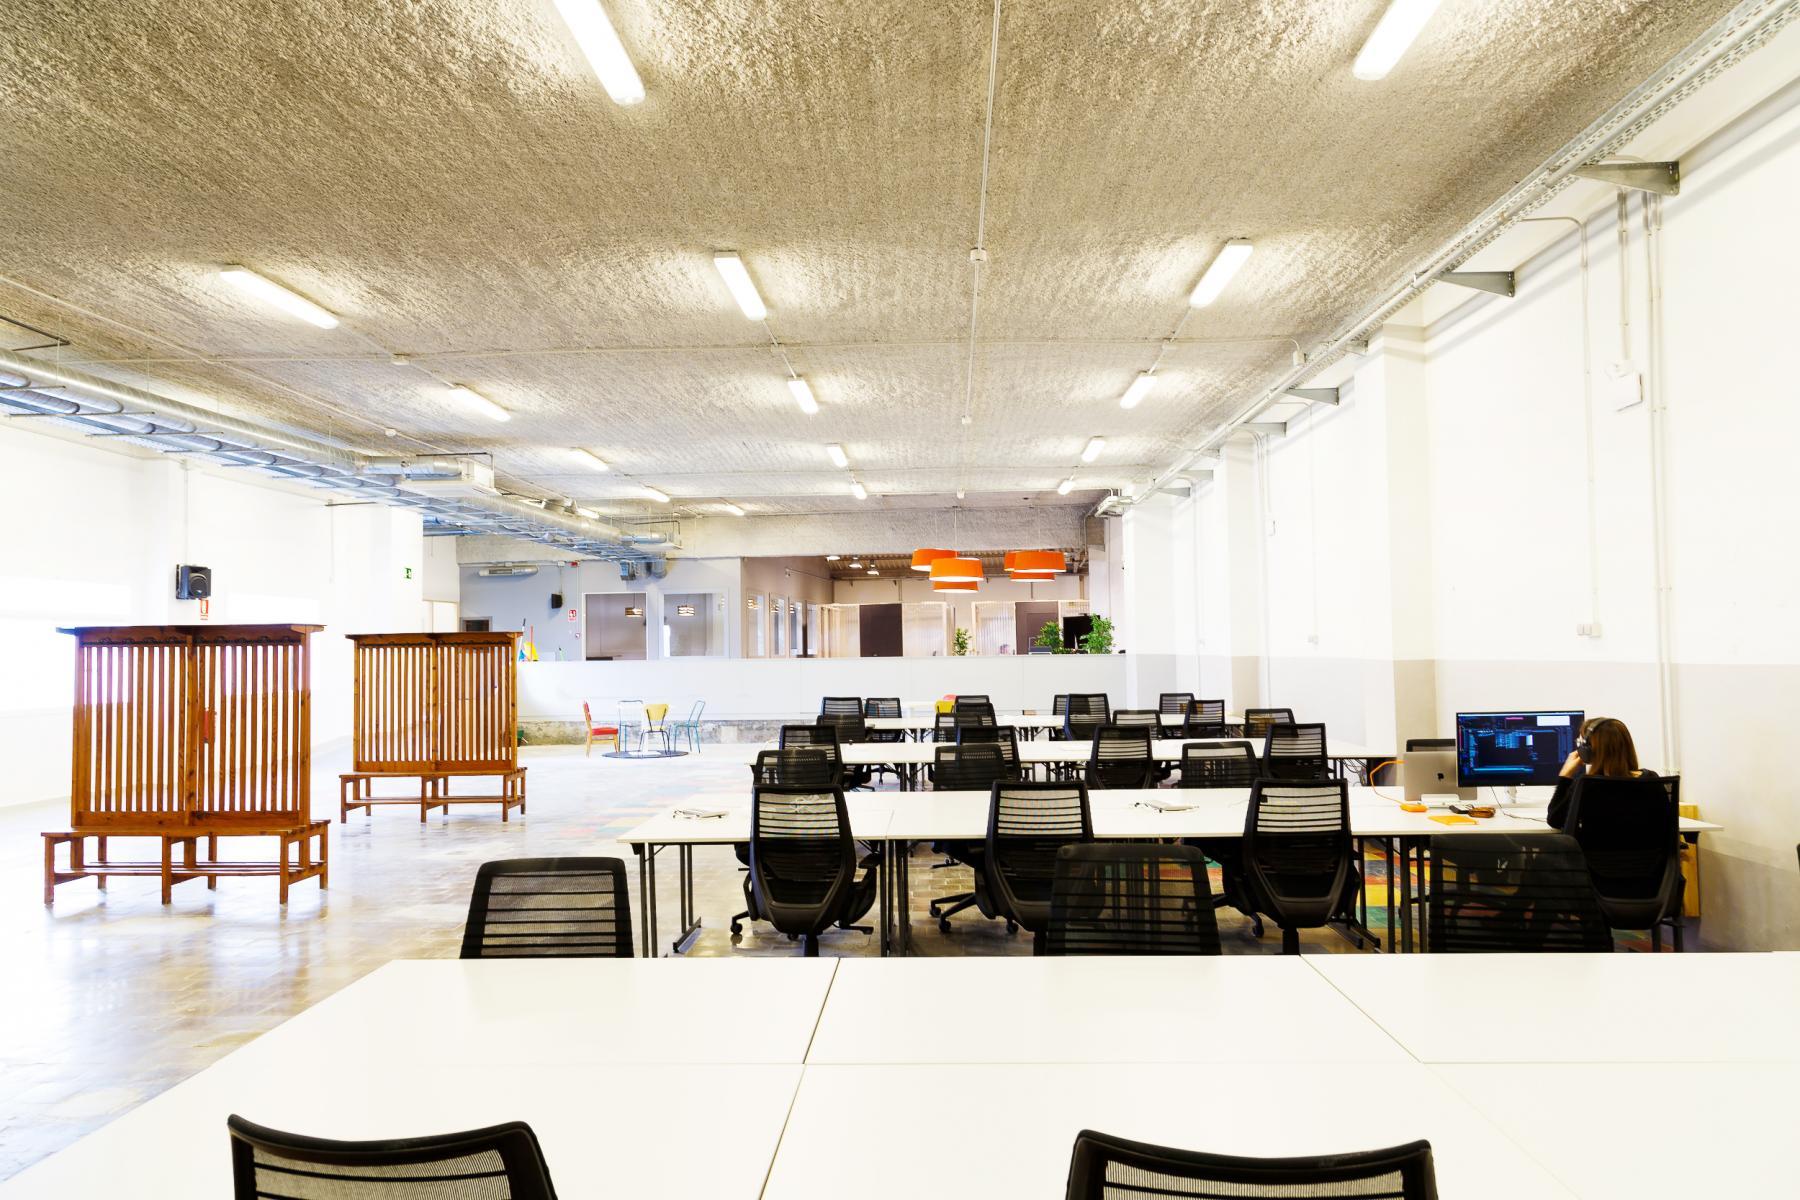 Alquilar oficinas Carrer del Sol 62, Barcelona (2)